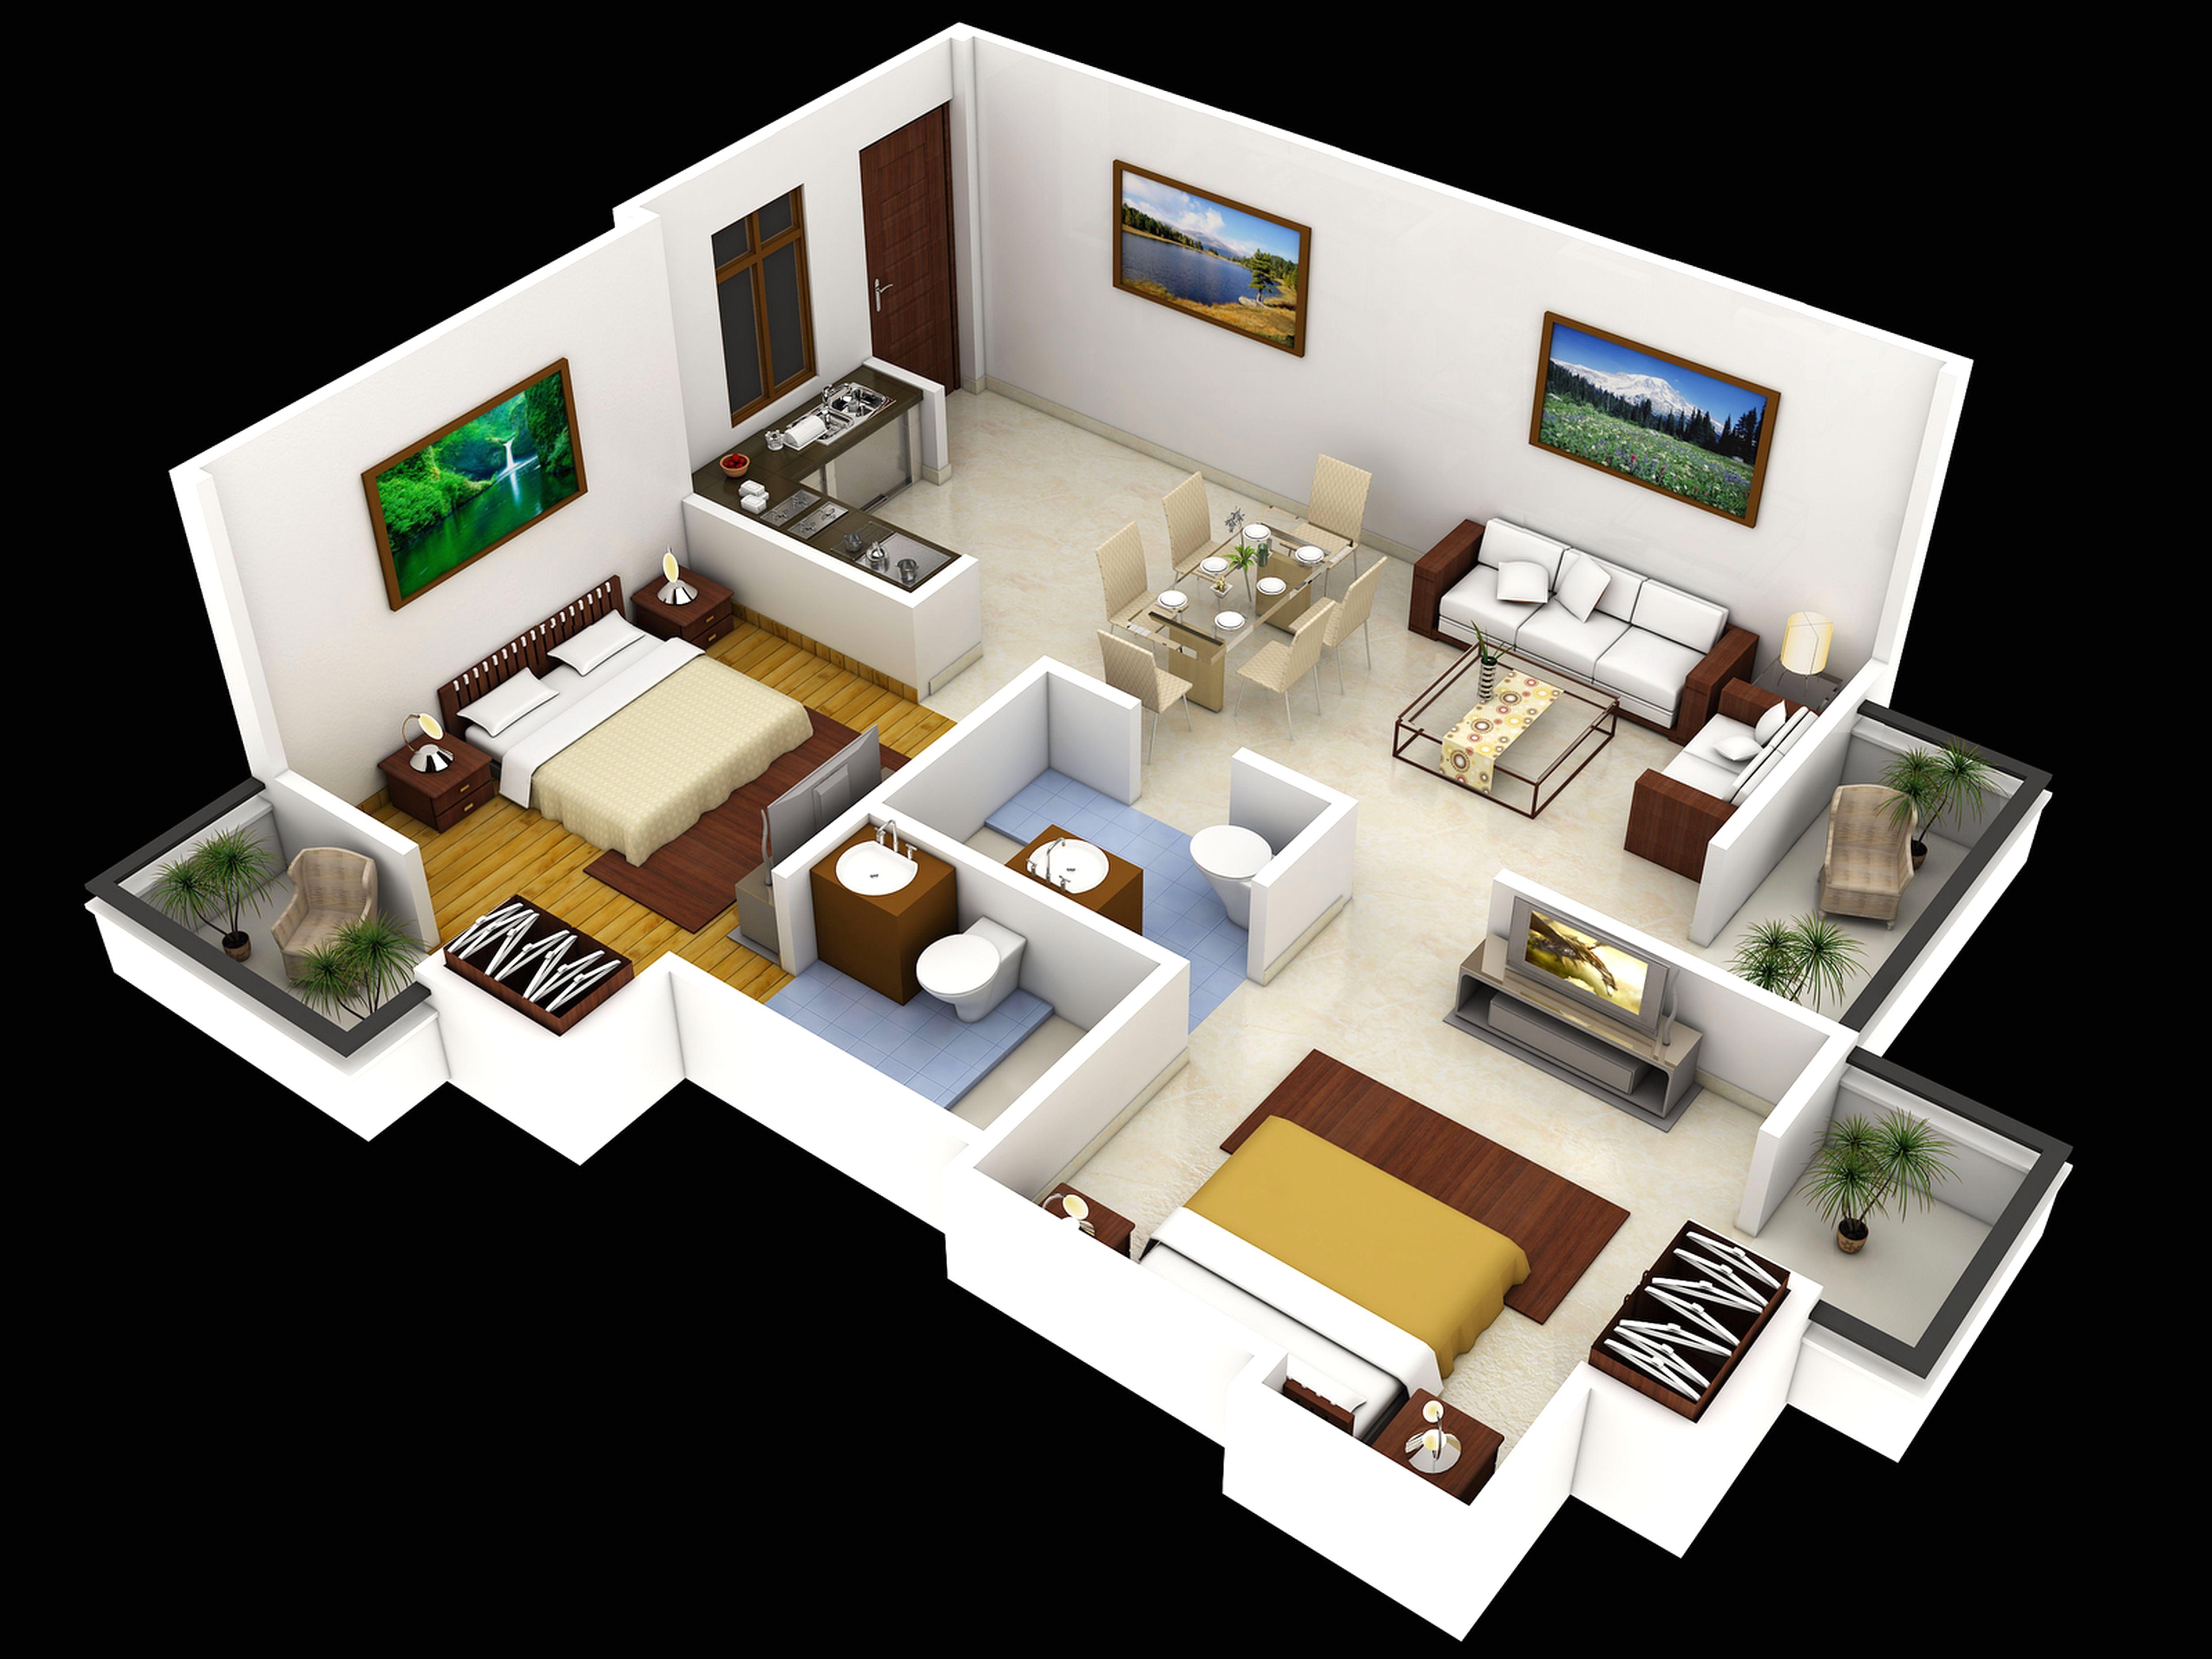 15 Denah Rumah Minimalis 2 Kamar Tidur 3D 2018 Terbaru